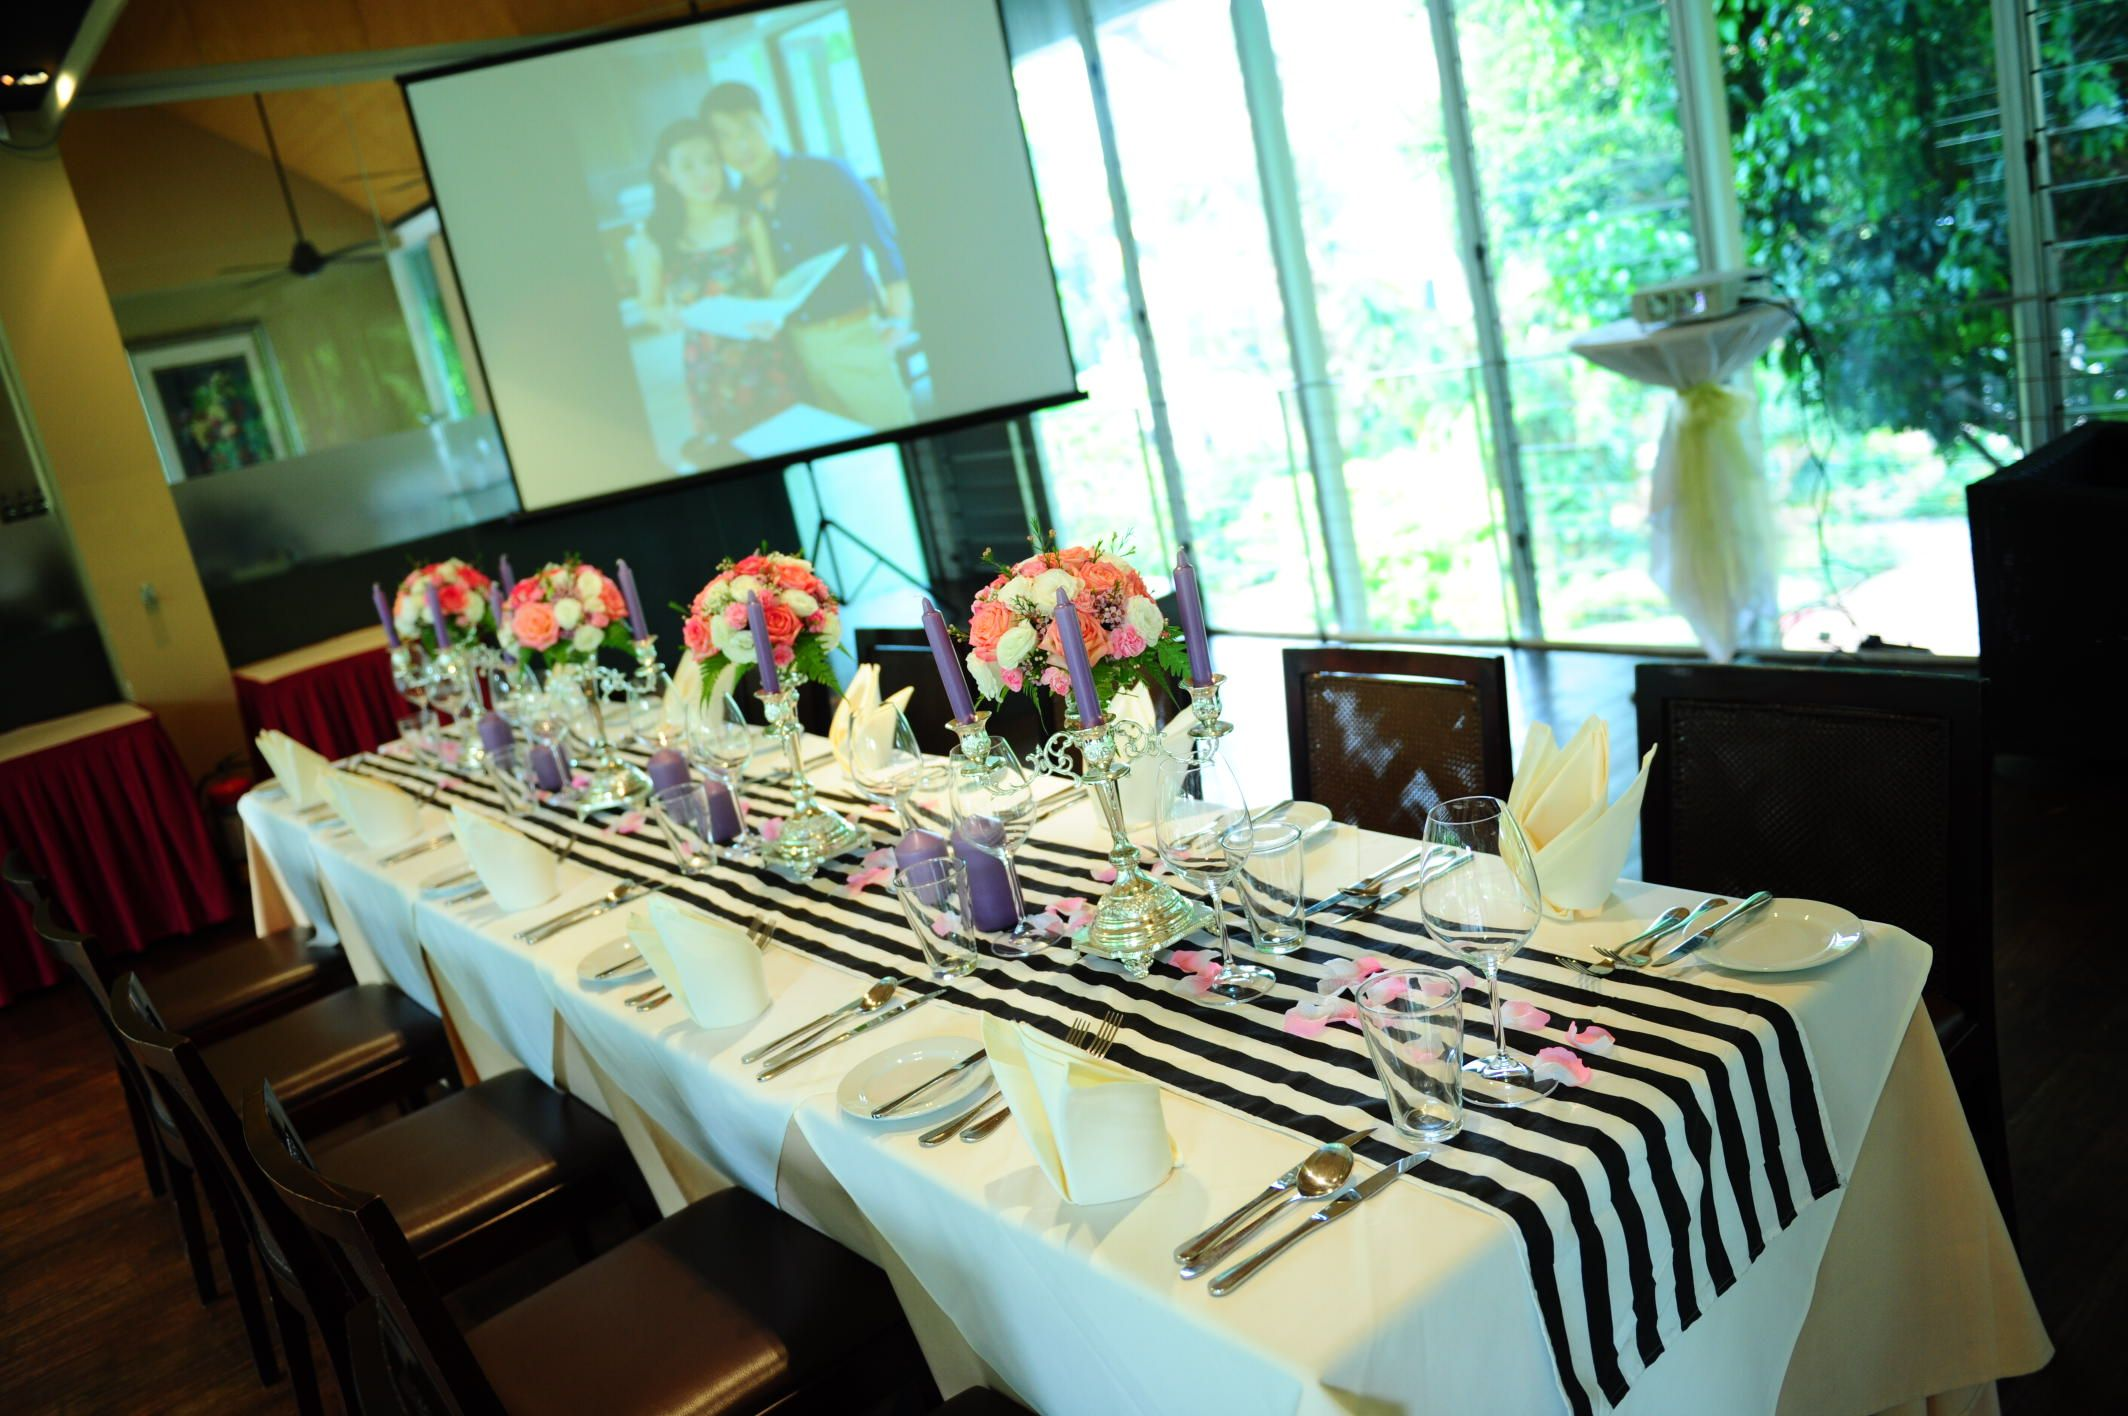 wedding reception photo booth singapore%0A Suburbia Sentosa Wedding Fair  Butterflies and Cakes Singapore  Decor